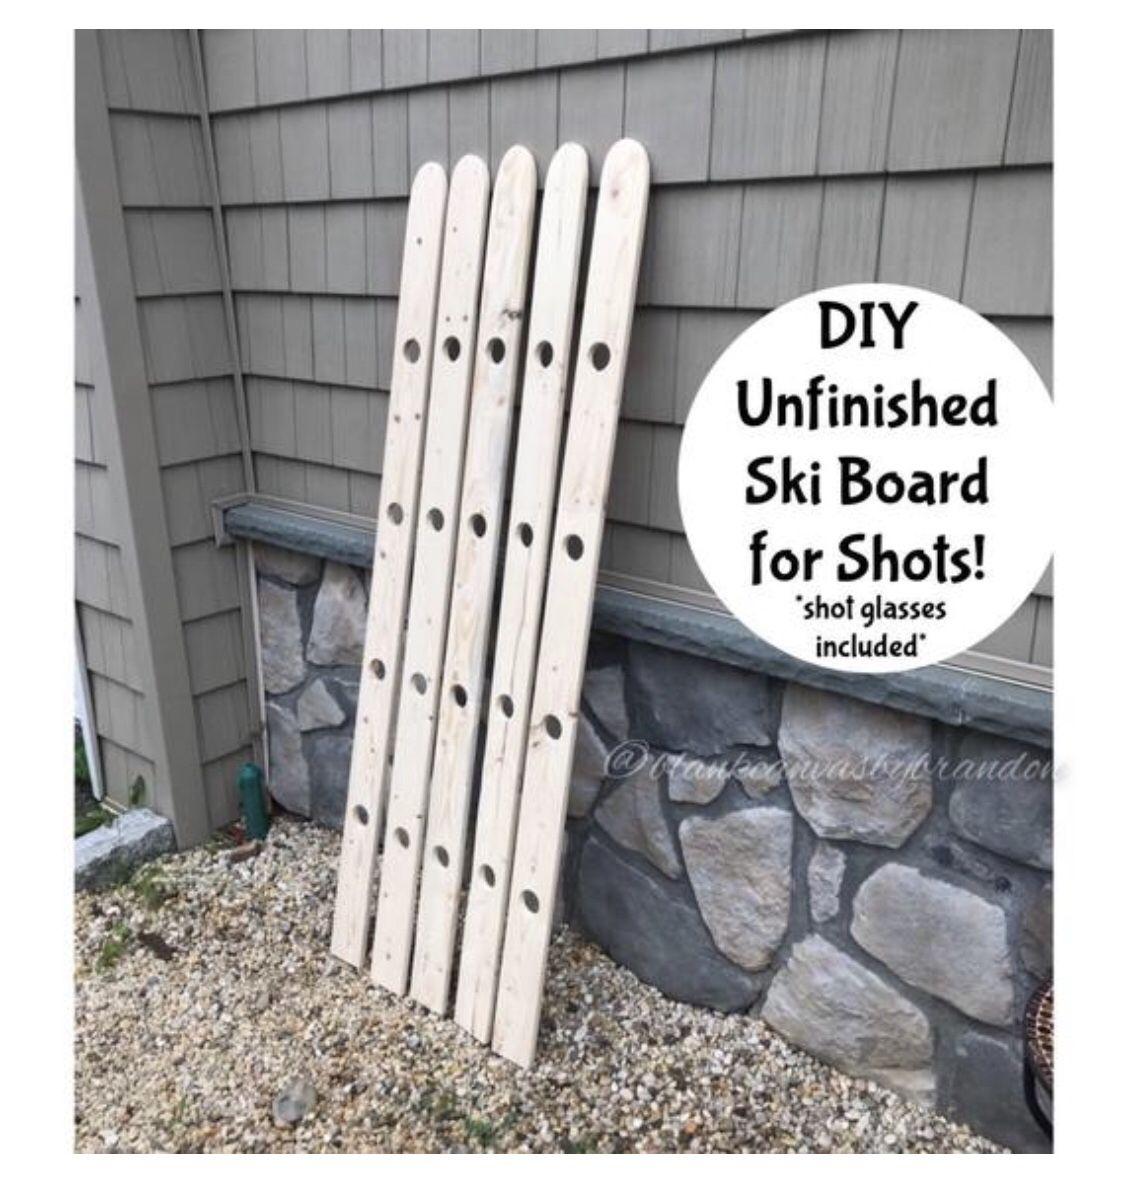 Unfinished Ski Board for Shots, DIY Wood Shot Board, Do It